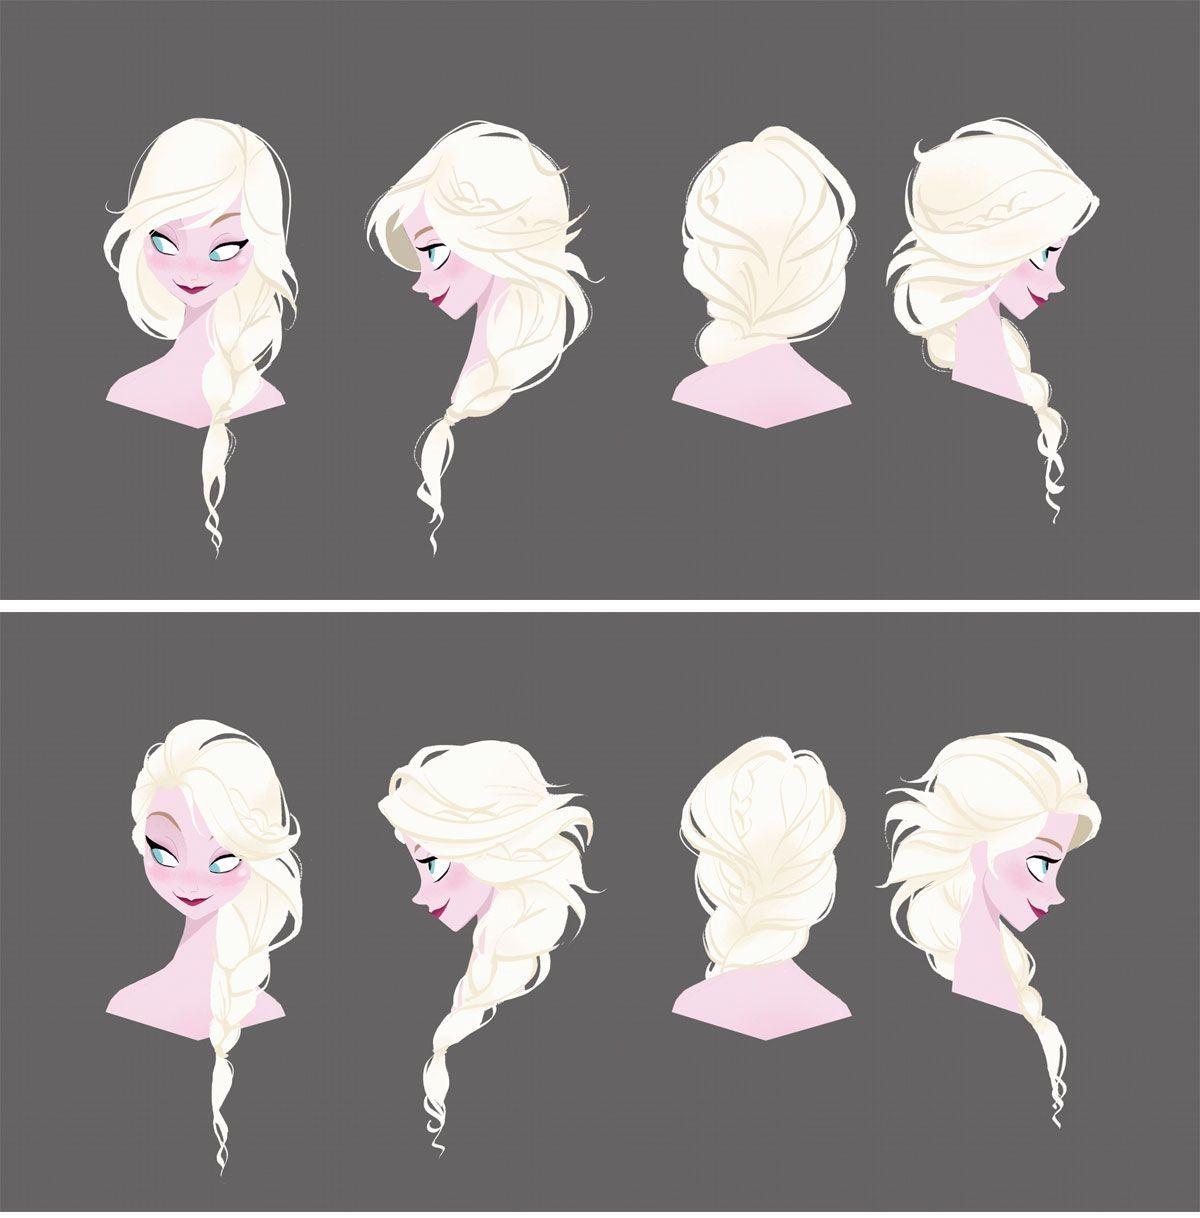 Resultado De Imagem Para Elsa Frozen Concept Art Disney Art Books Disney Concept Art Frozen Art